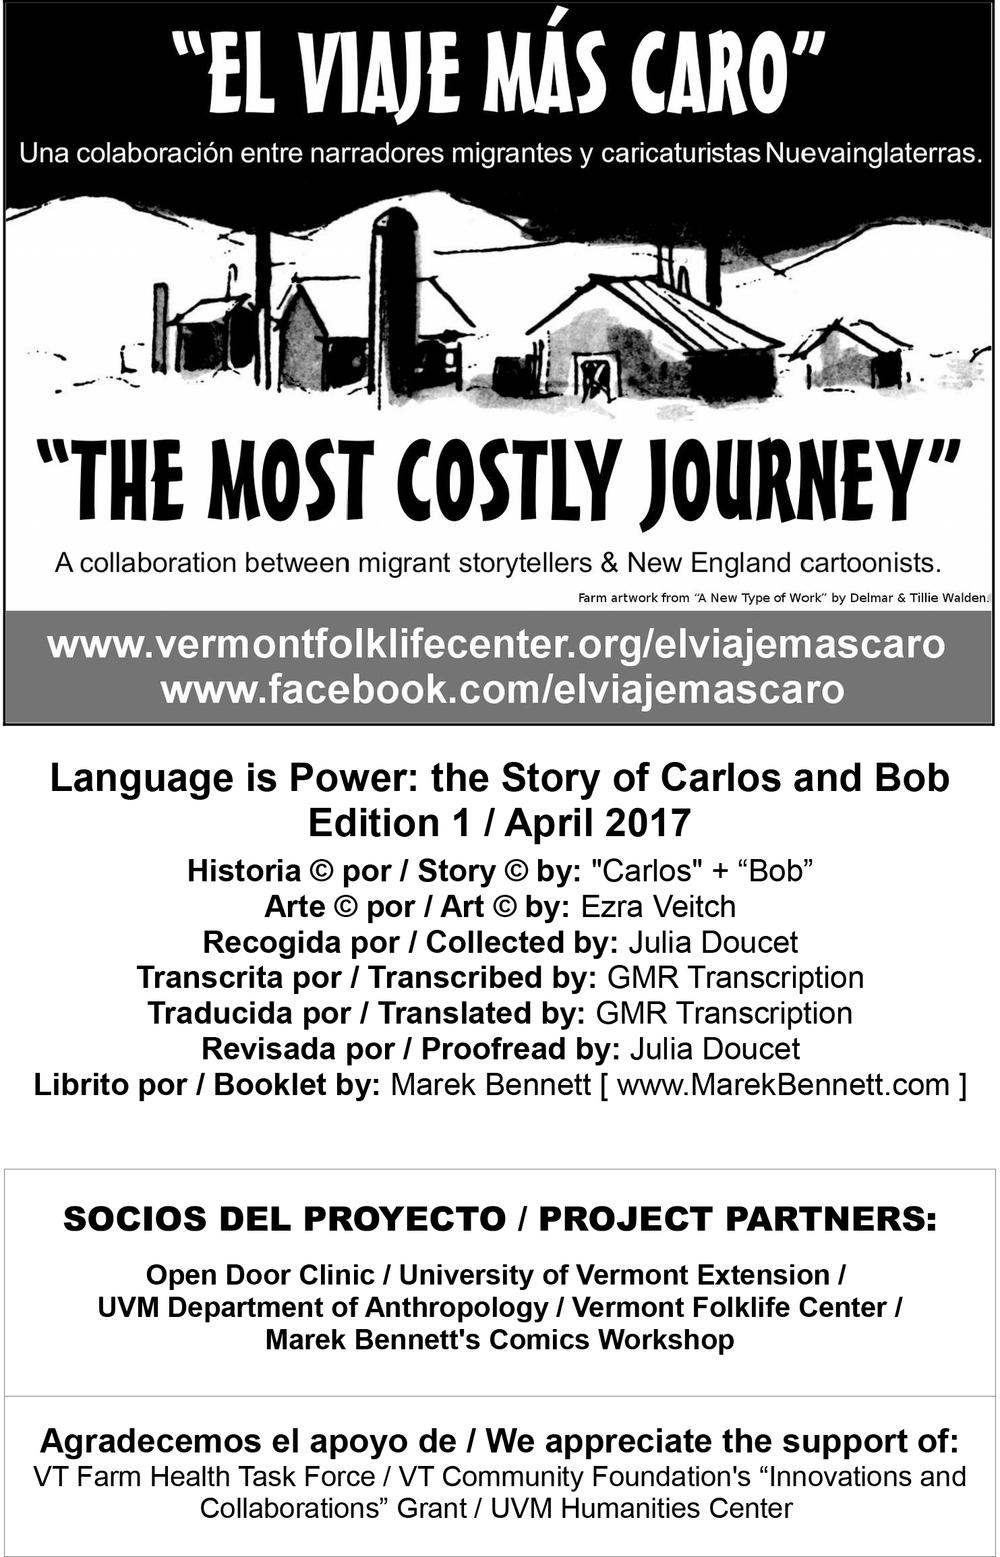 BOOKLET-170400_Carlos+Bob_Ezra_Digest_ENG-8page 8.png